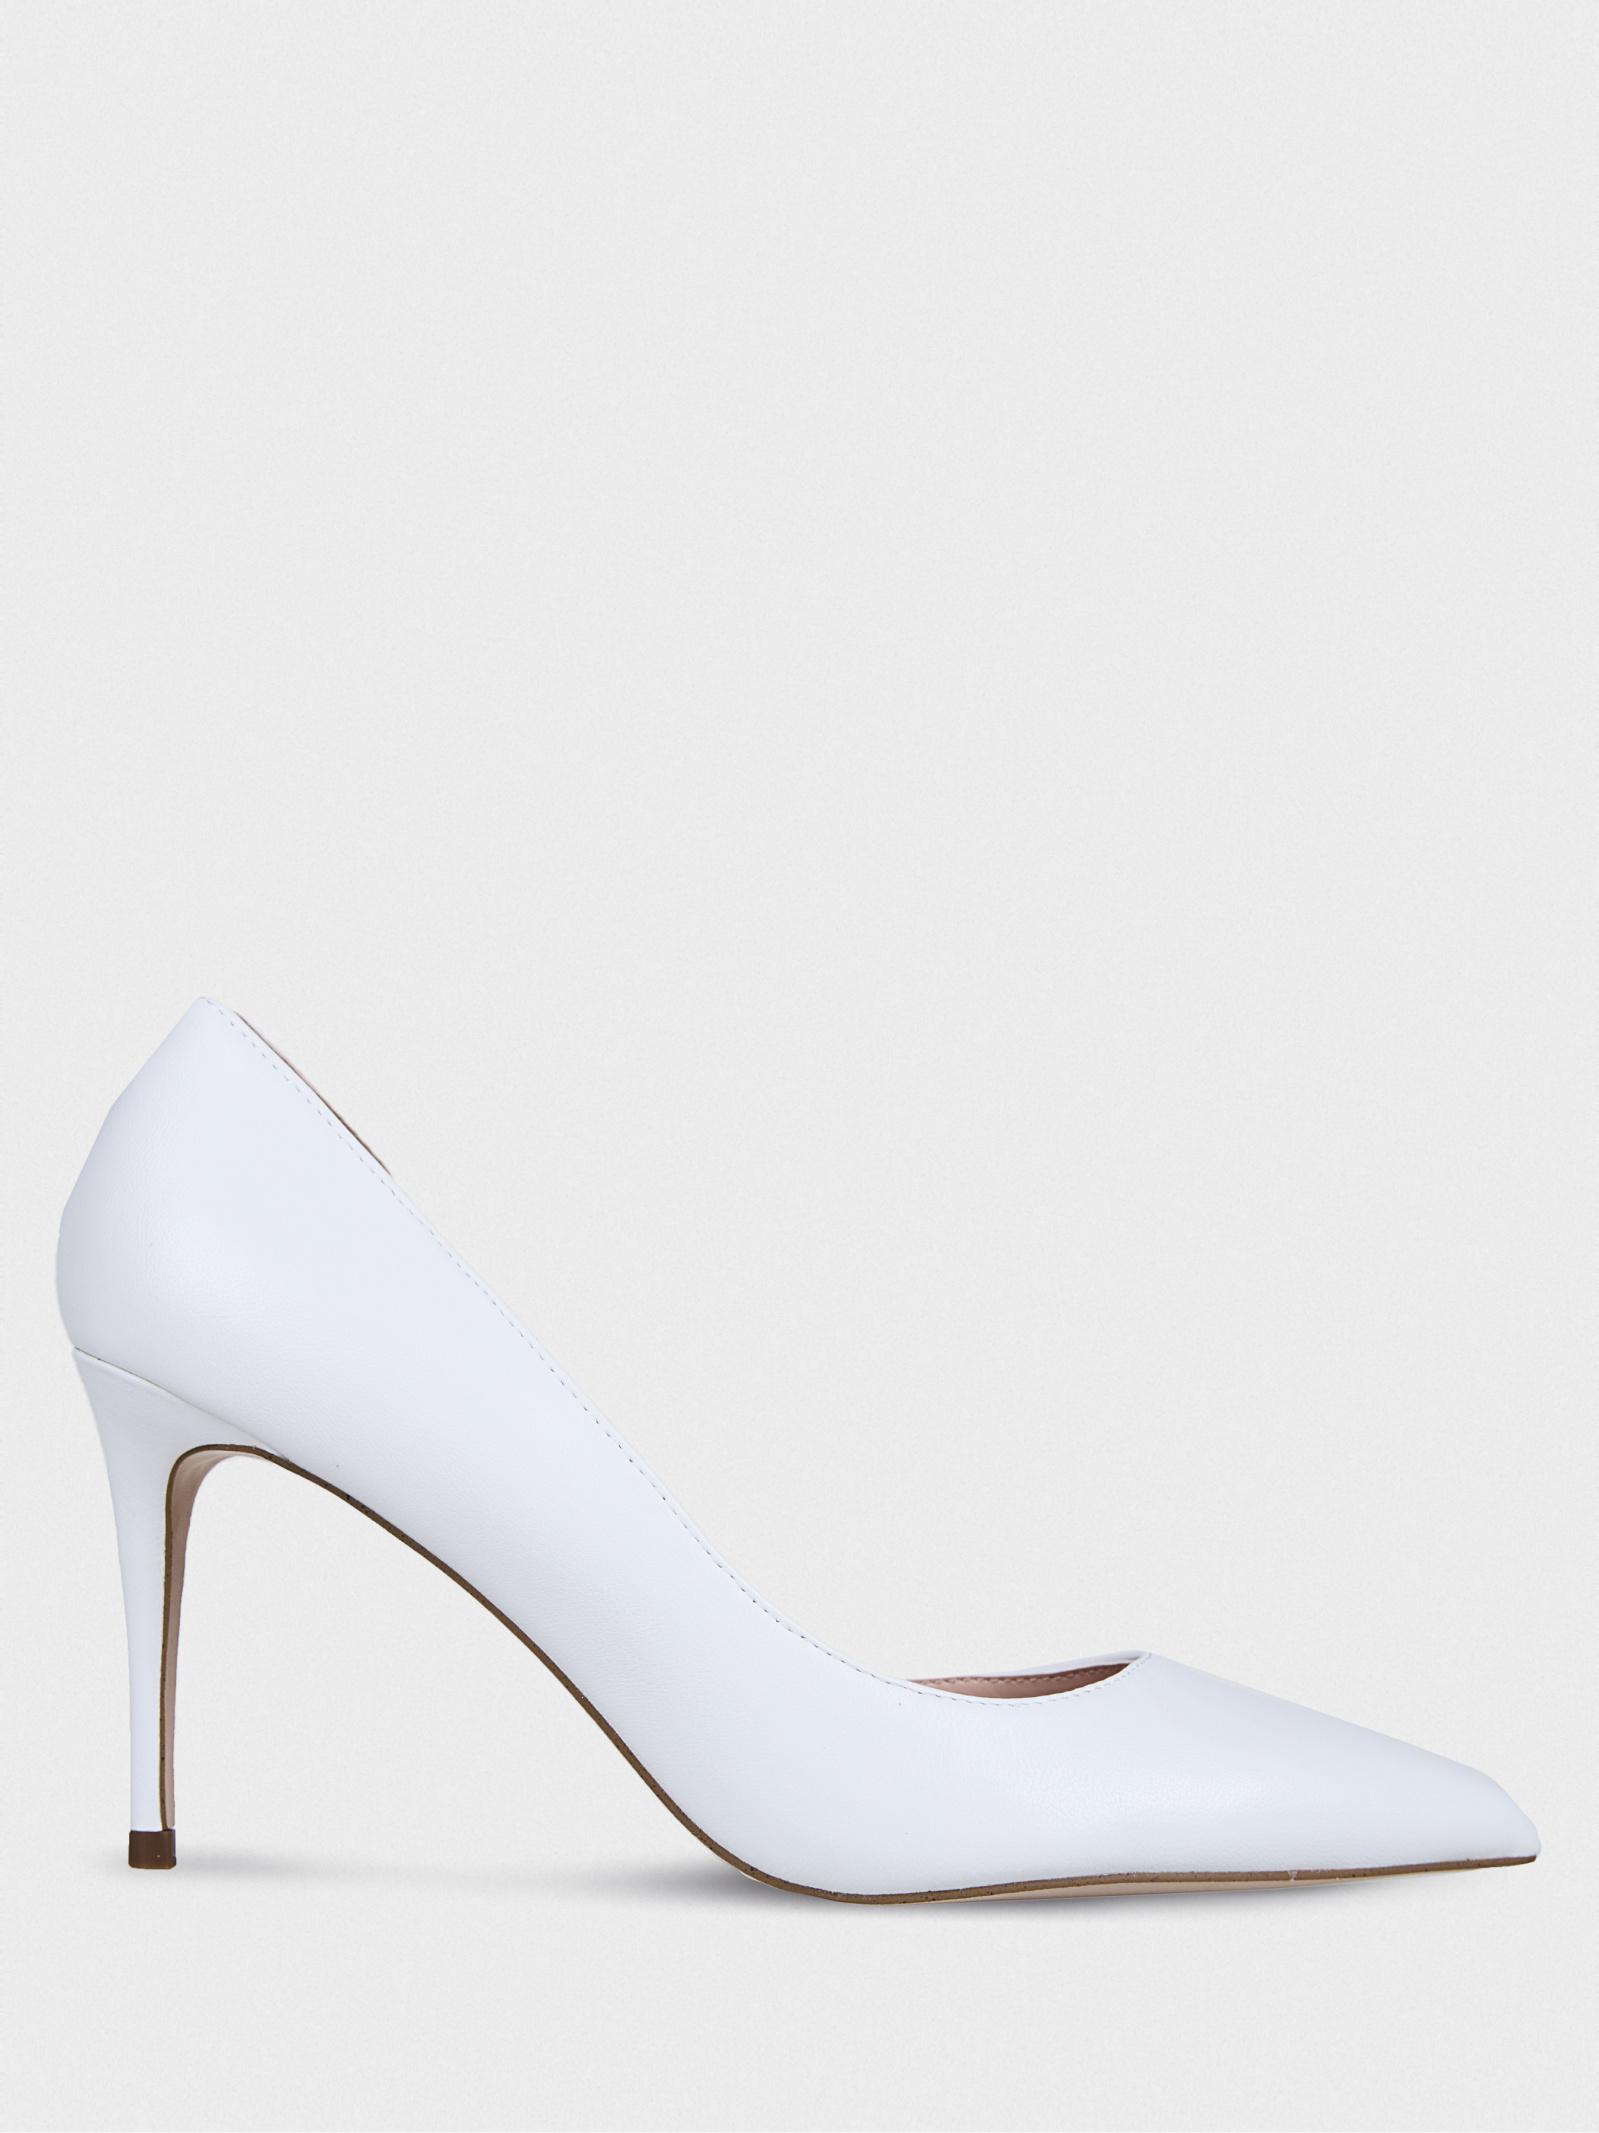 Туфли женские Steve Madden LESSONS SM11000961 WHITE LEATHER размерная сетка обуви, 2017